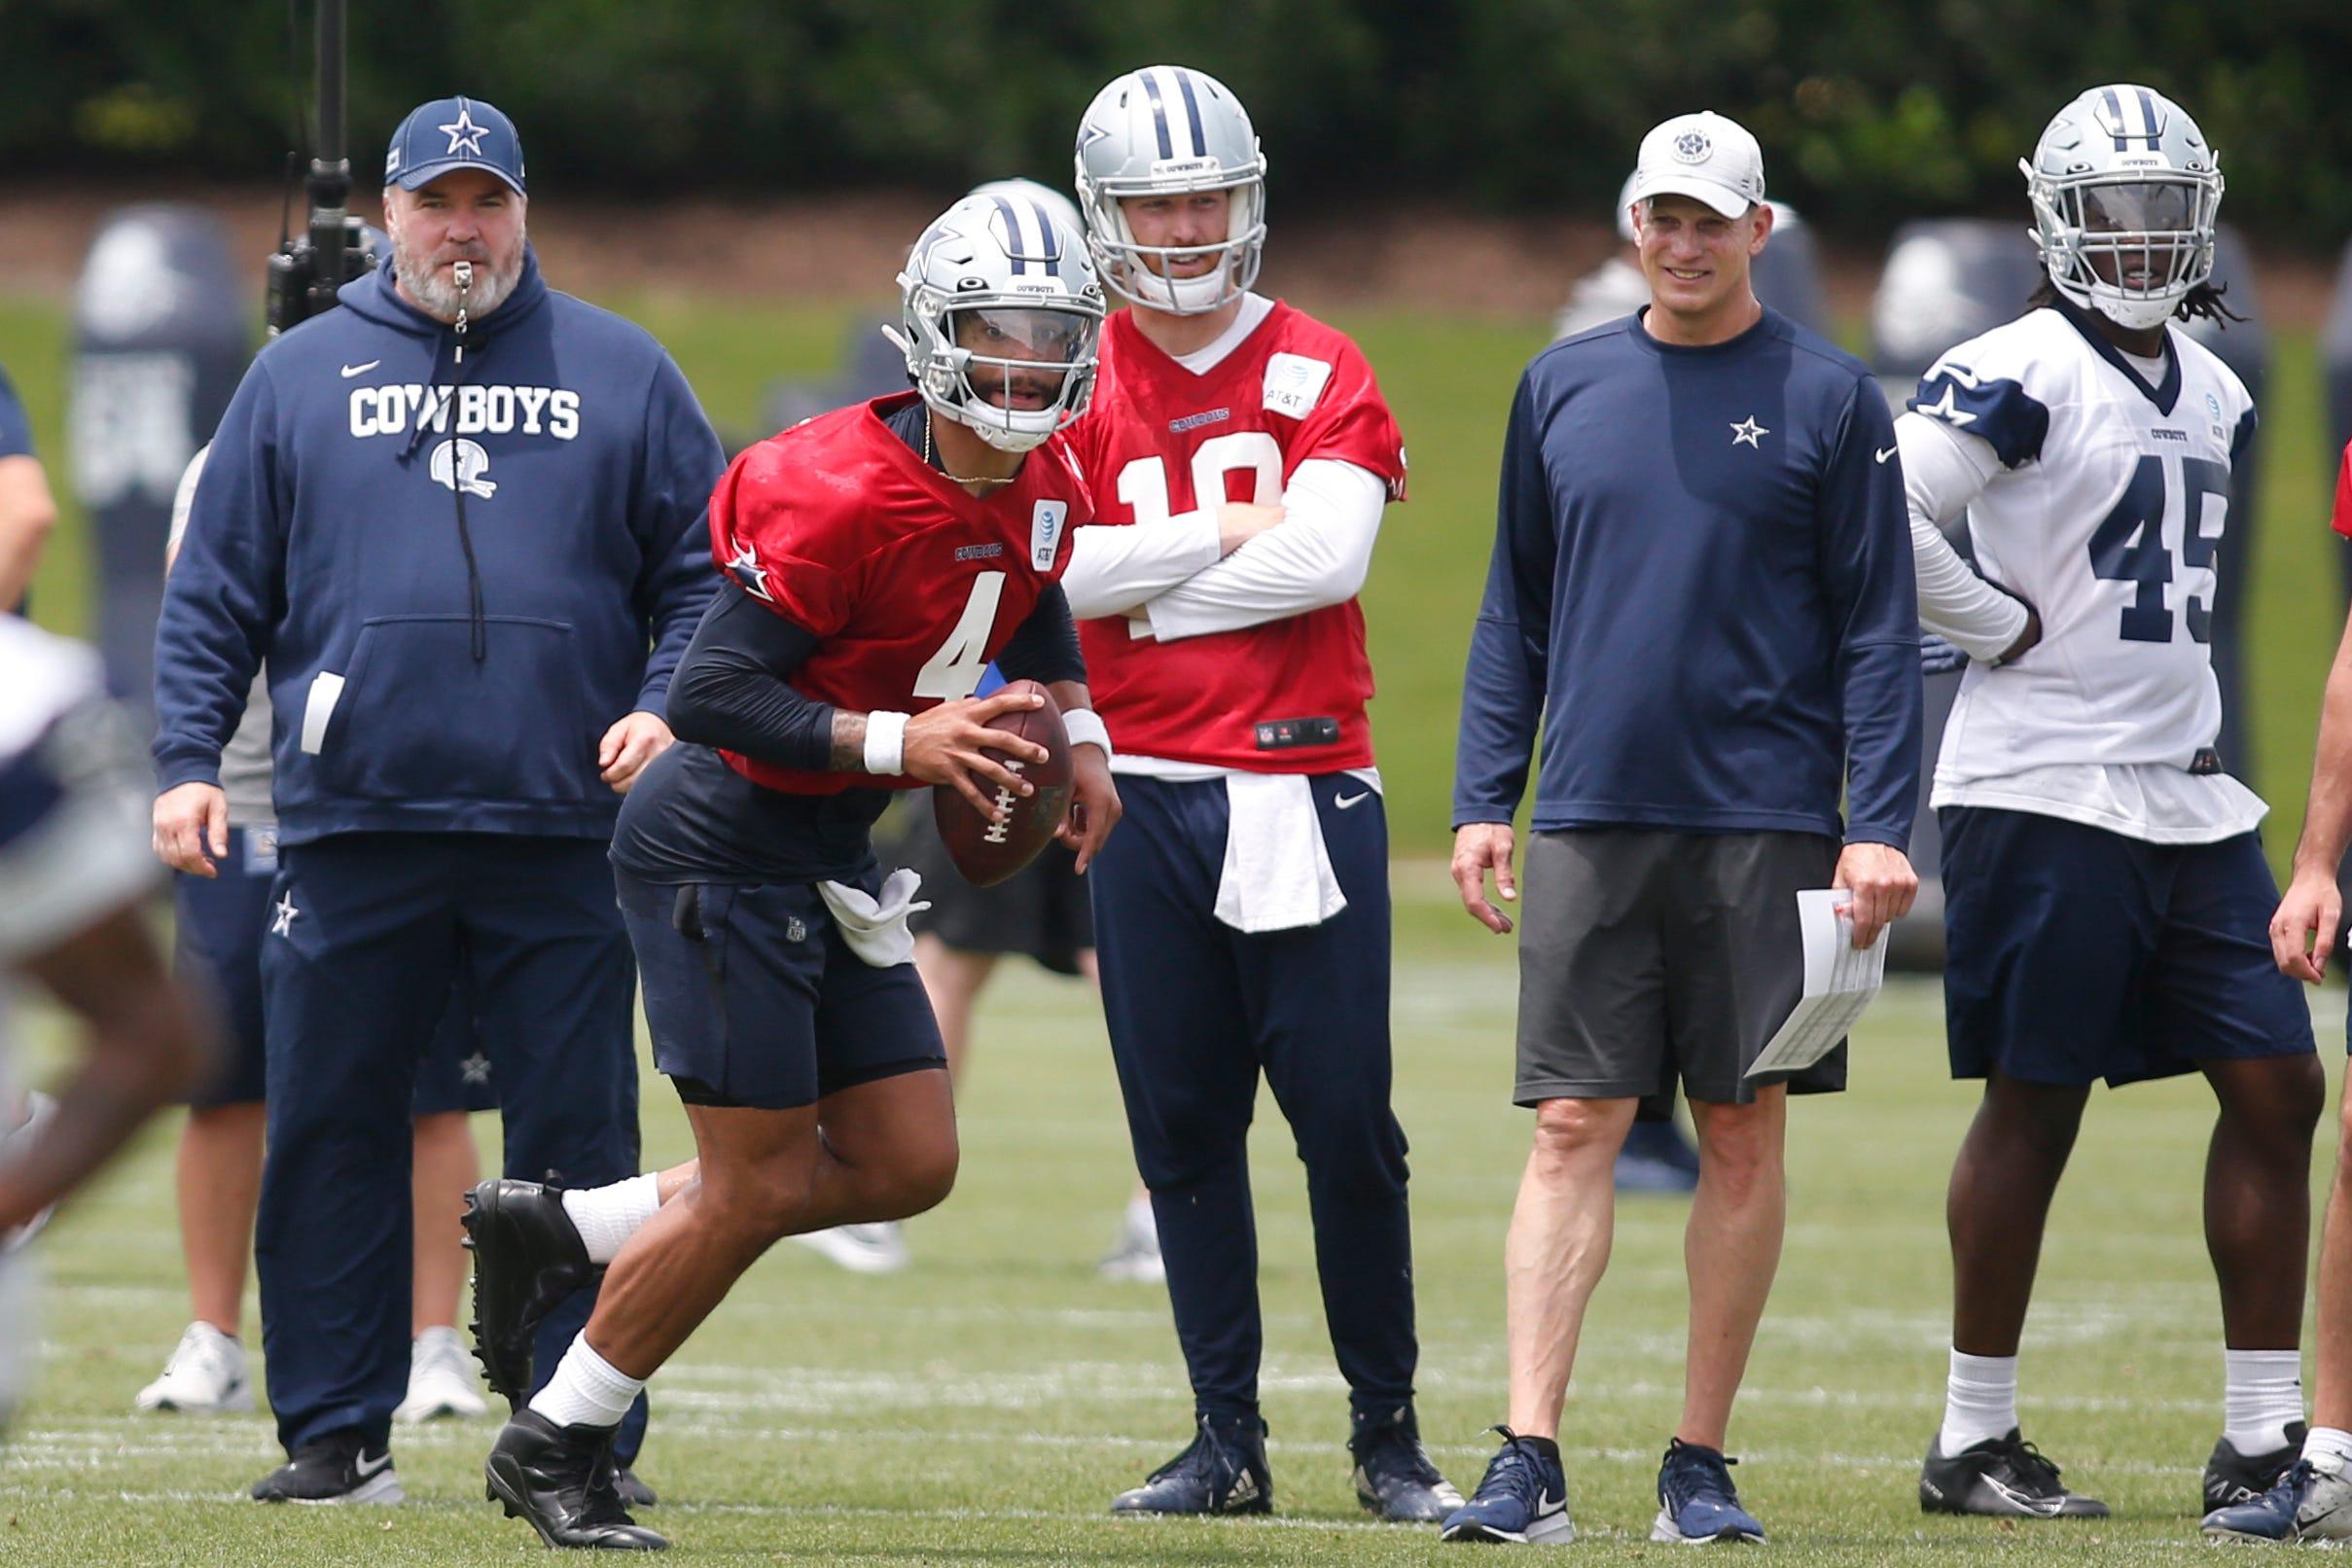 Cowboys QB Dak Prescott leaves Adidas, signs deal to become Jordan Brand s highest-paid NFL athlete